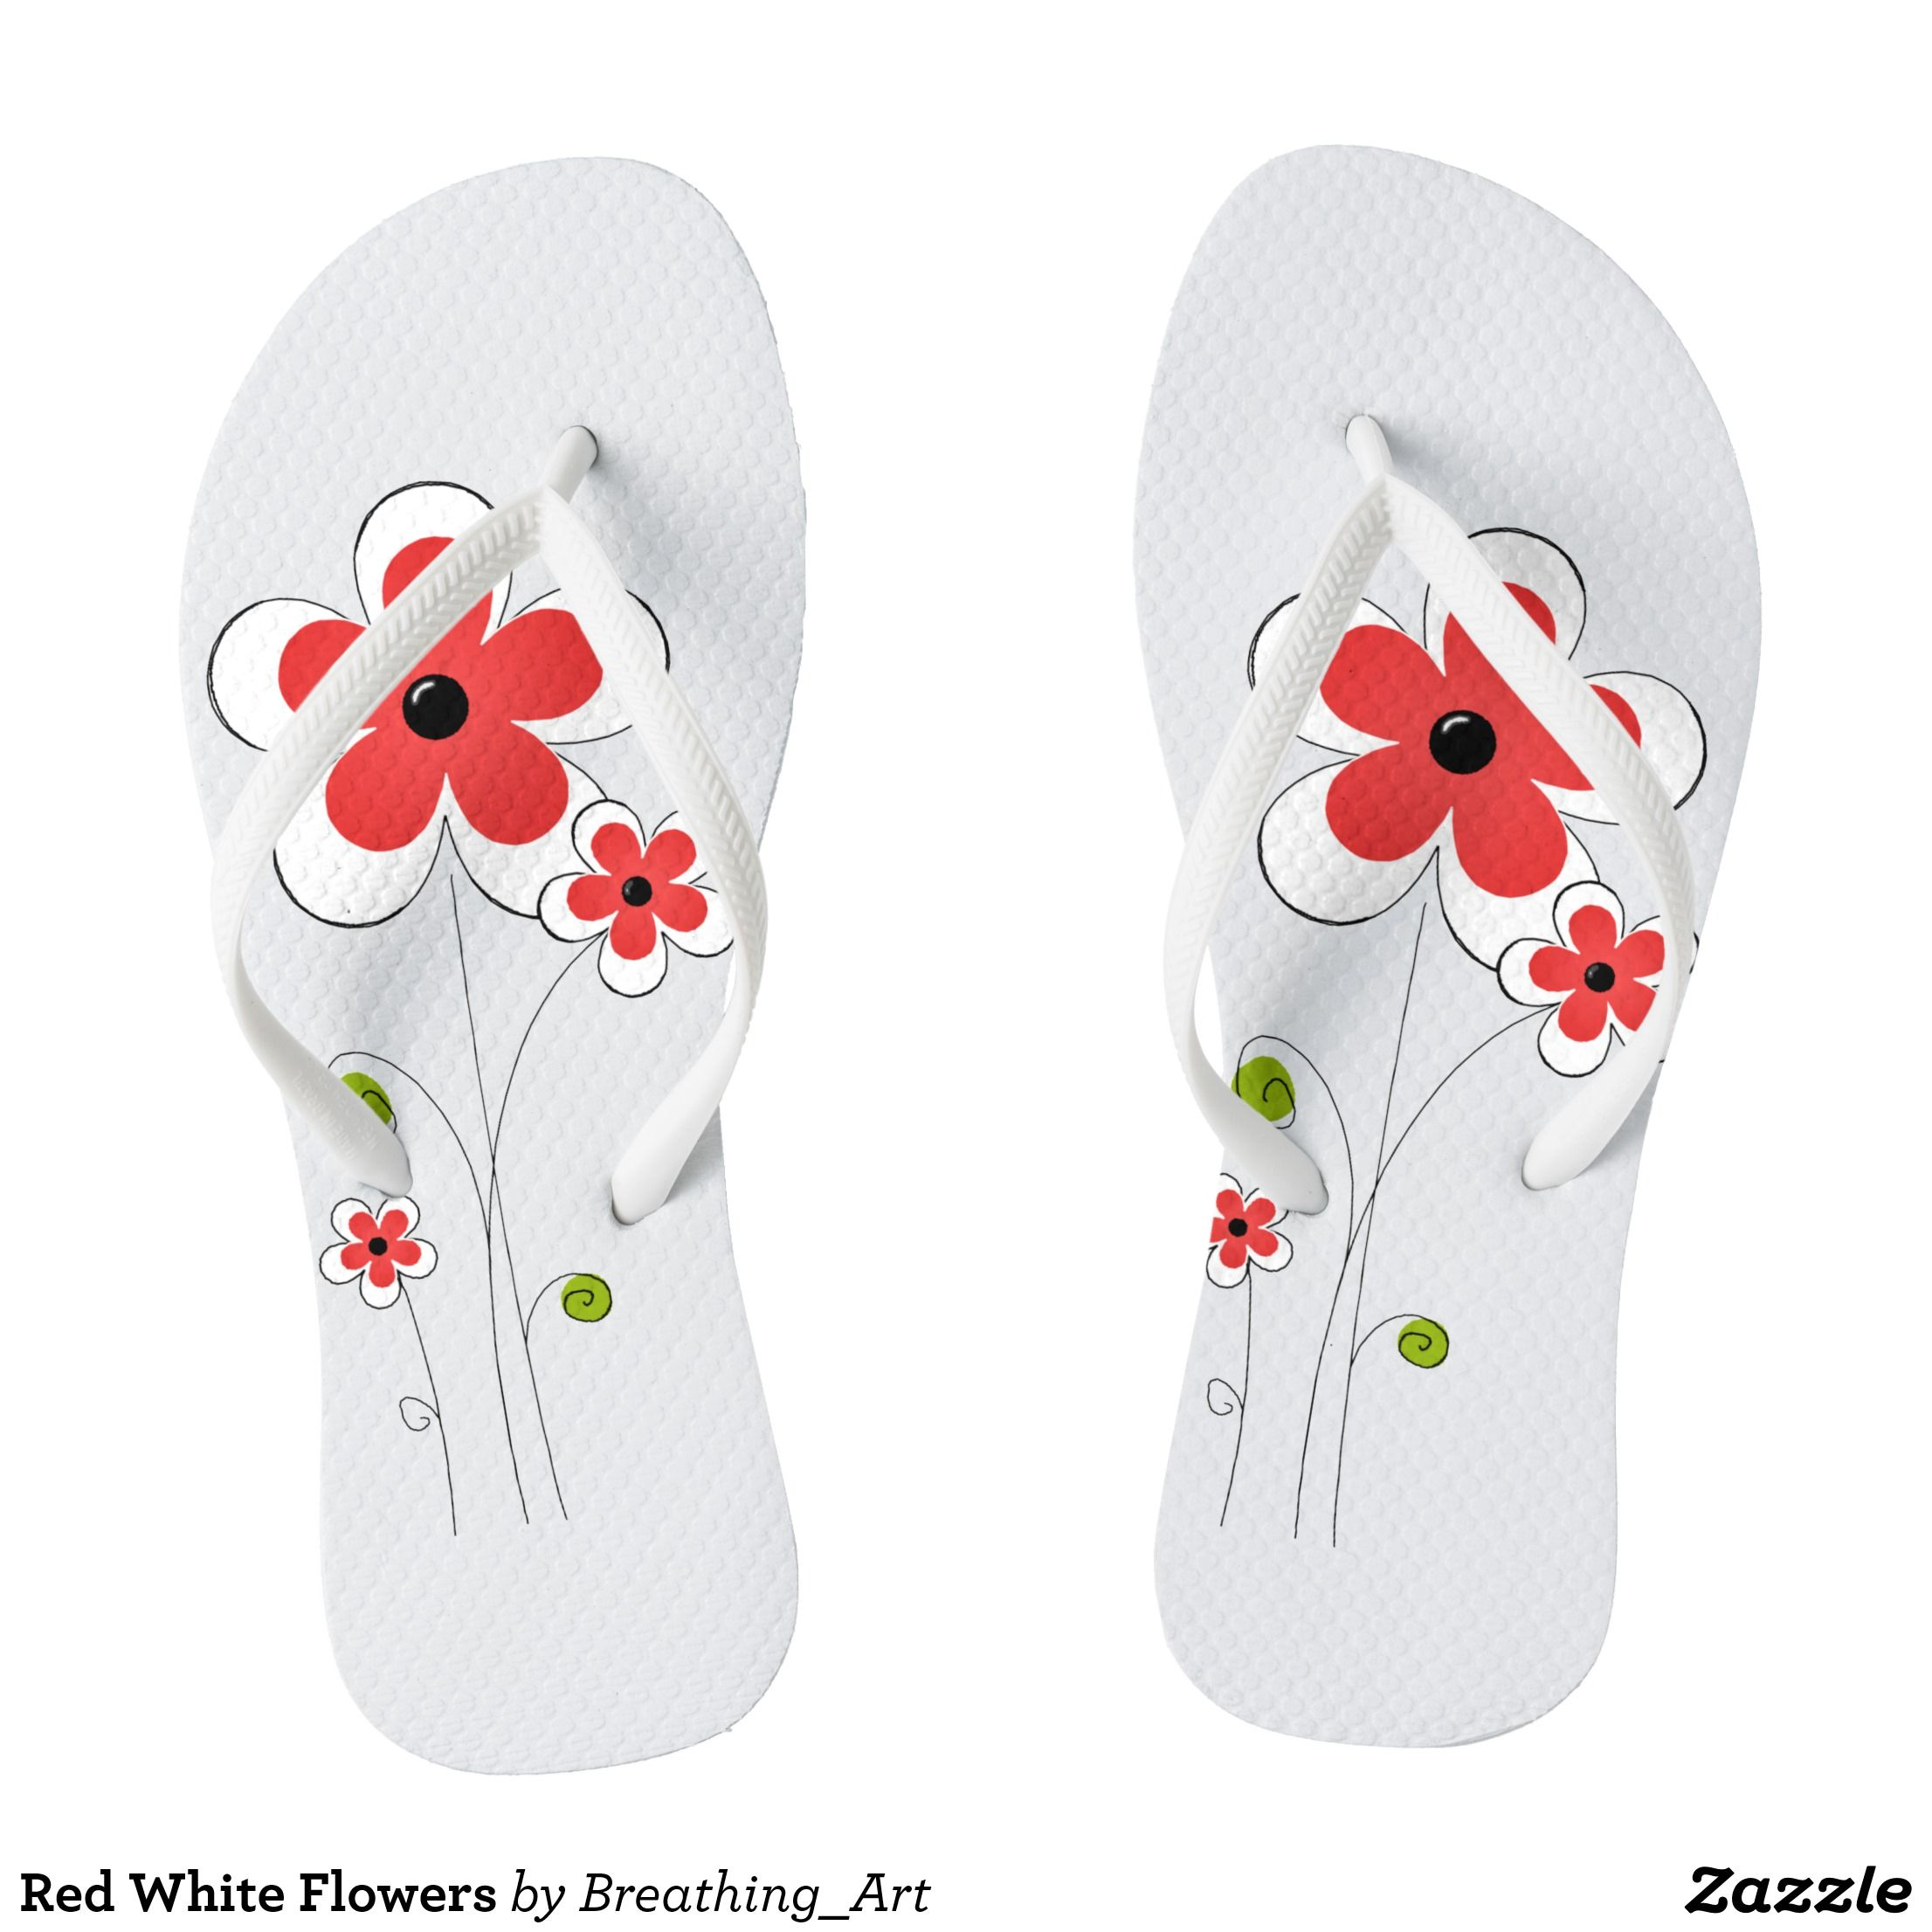 Red white flowers flip flops flip flops durable thong style red white flowers flip flops durable thong style hawaiian beach sandals by talented fashion mightylinksfo